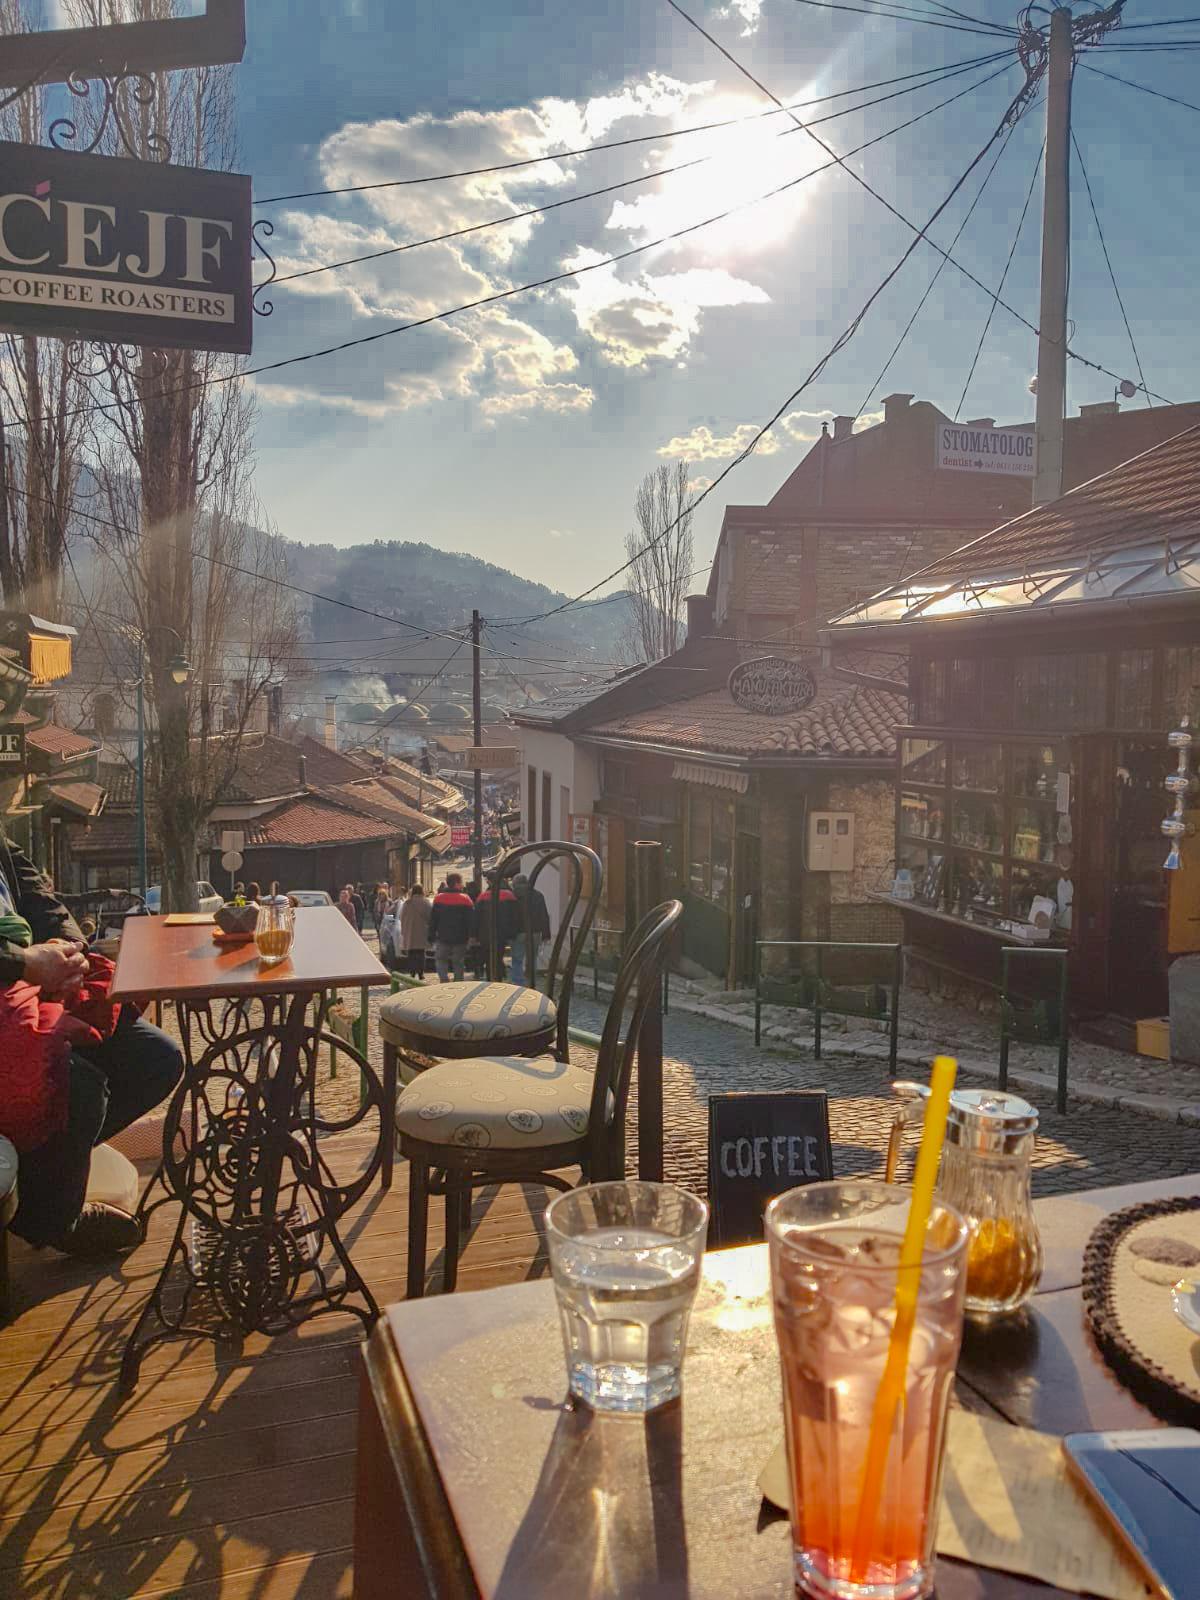 cejf, bosnia, sarajevo, tradition, enjoying life, balkans, coffee in sarajevo, food in sarajevo, blog about sarajevo, blog about life, life in bosnia, sarajevo with locals